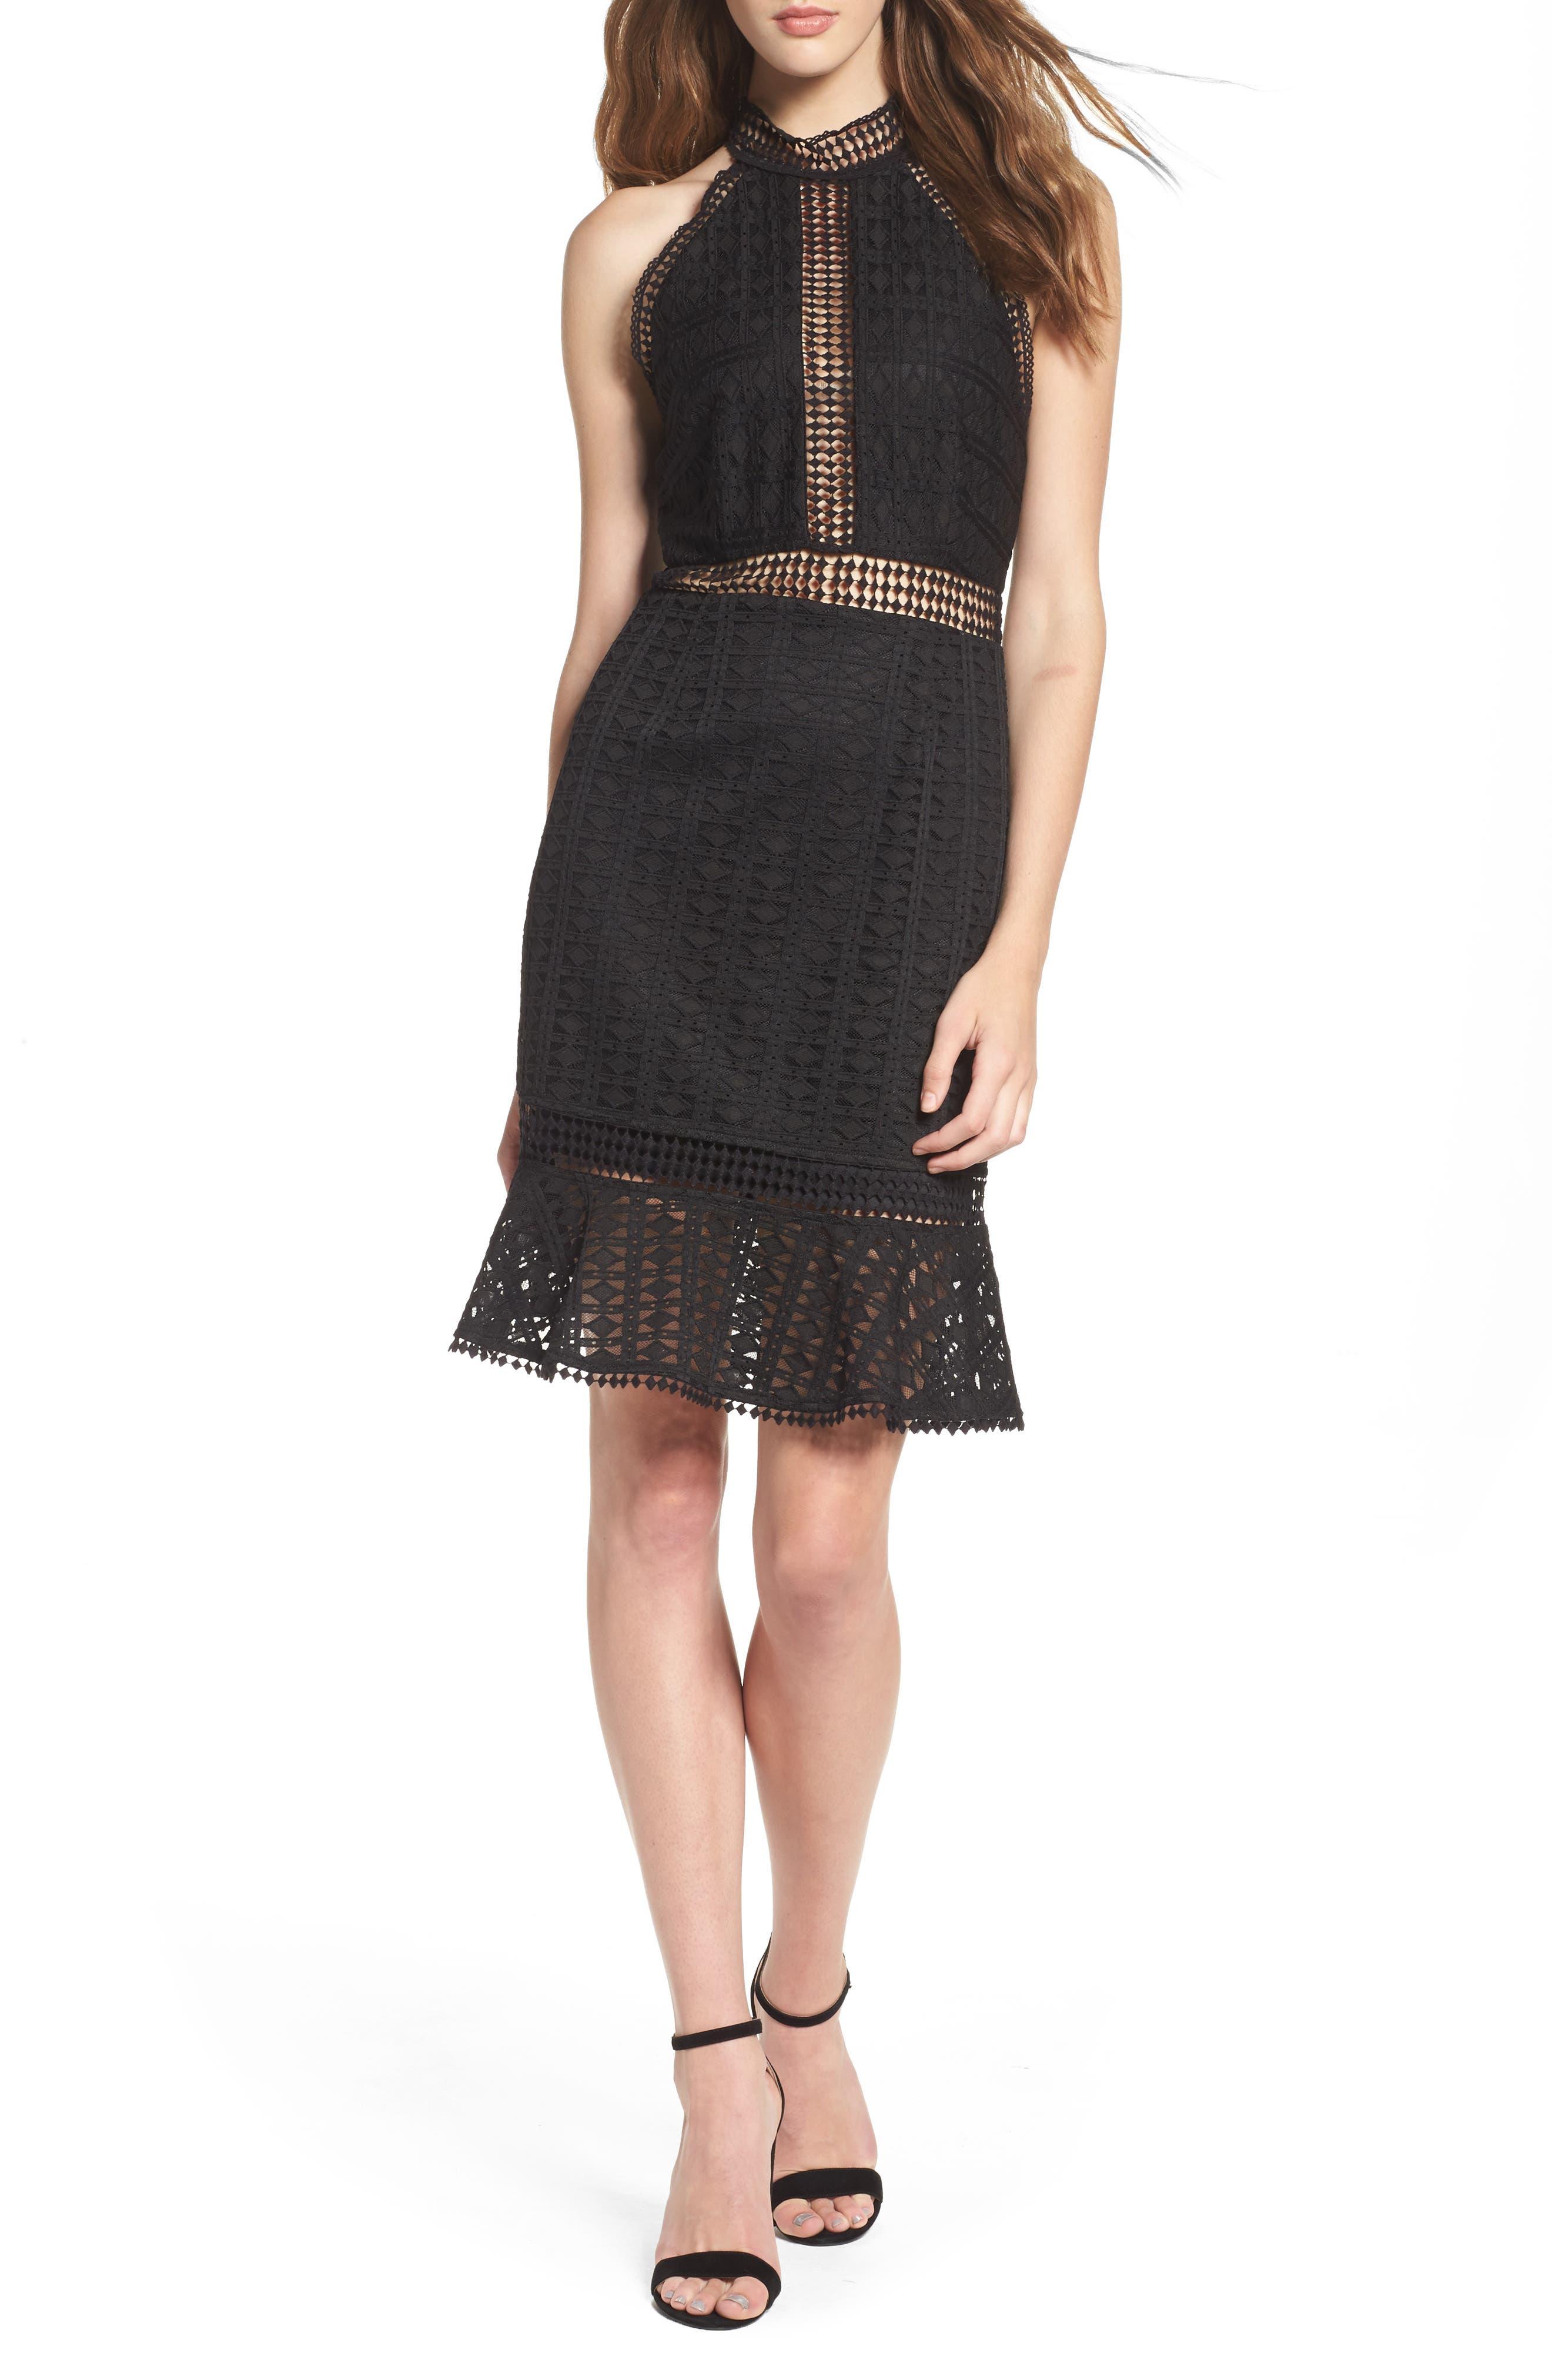 NSR Lace Halter Dress